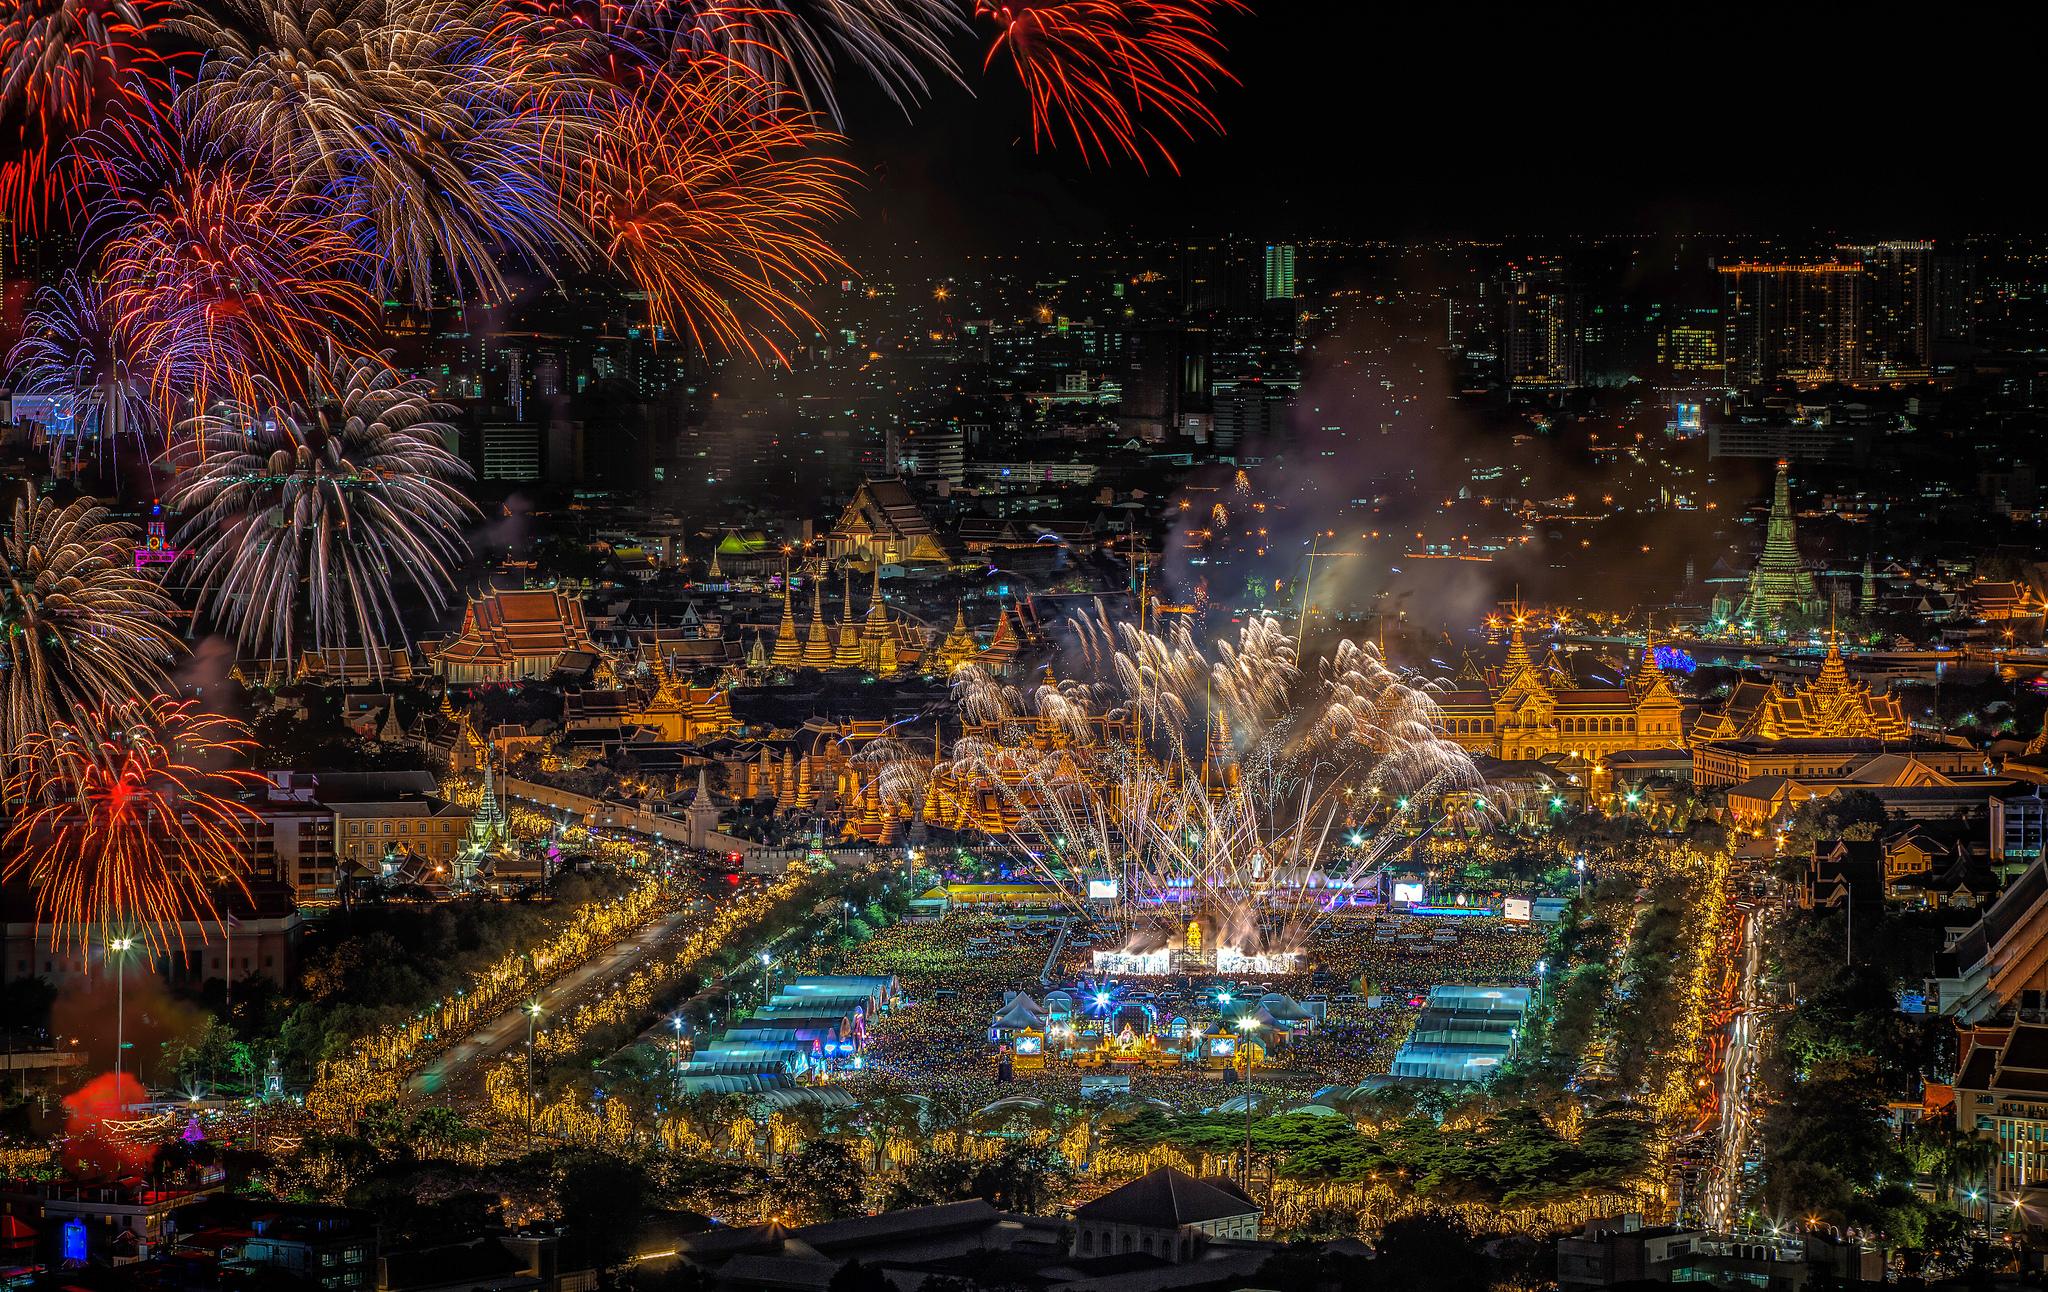 Night lights holiday - Download Wallpaper Night Lights Holiday Salute Panorama Thailand Fireworks Bangkok Section Resolution 2048x1292